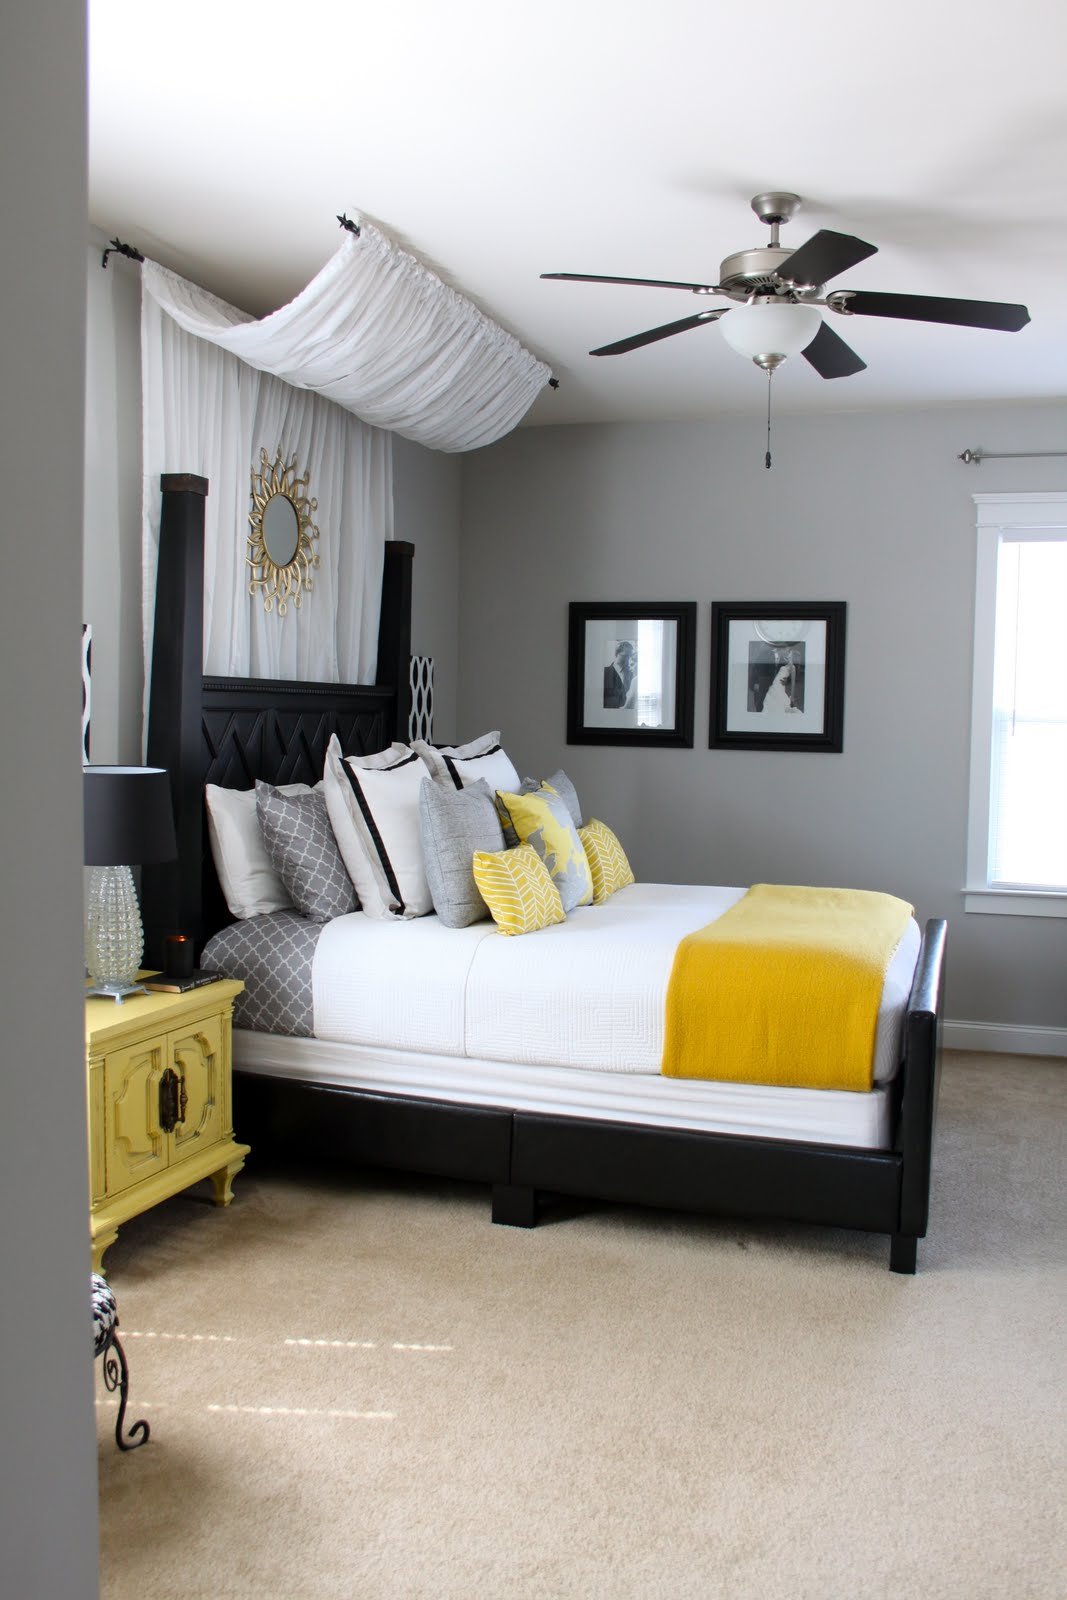 DIY Canopy Master Bedroom  The New Mrs Stott